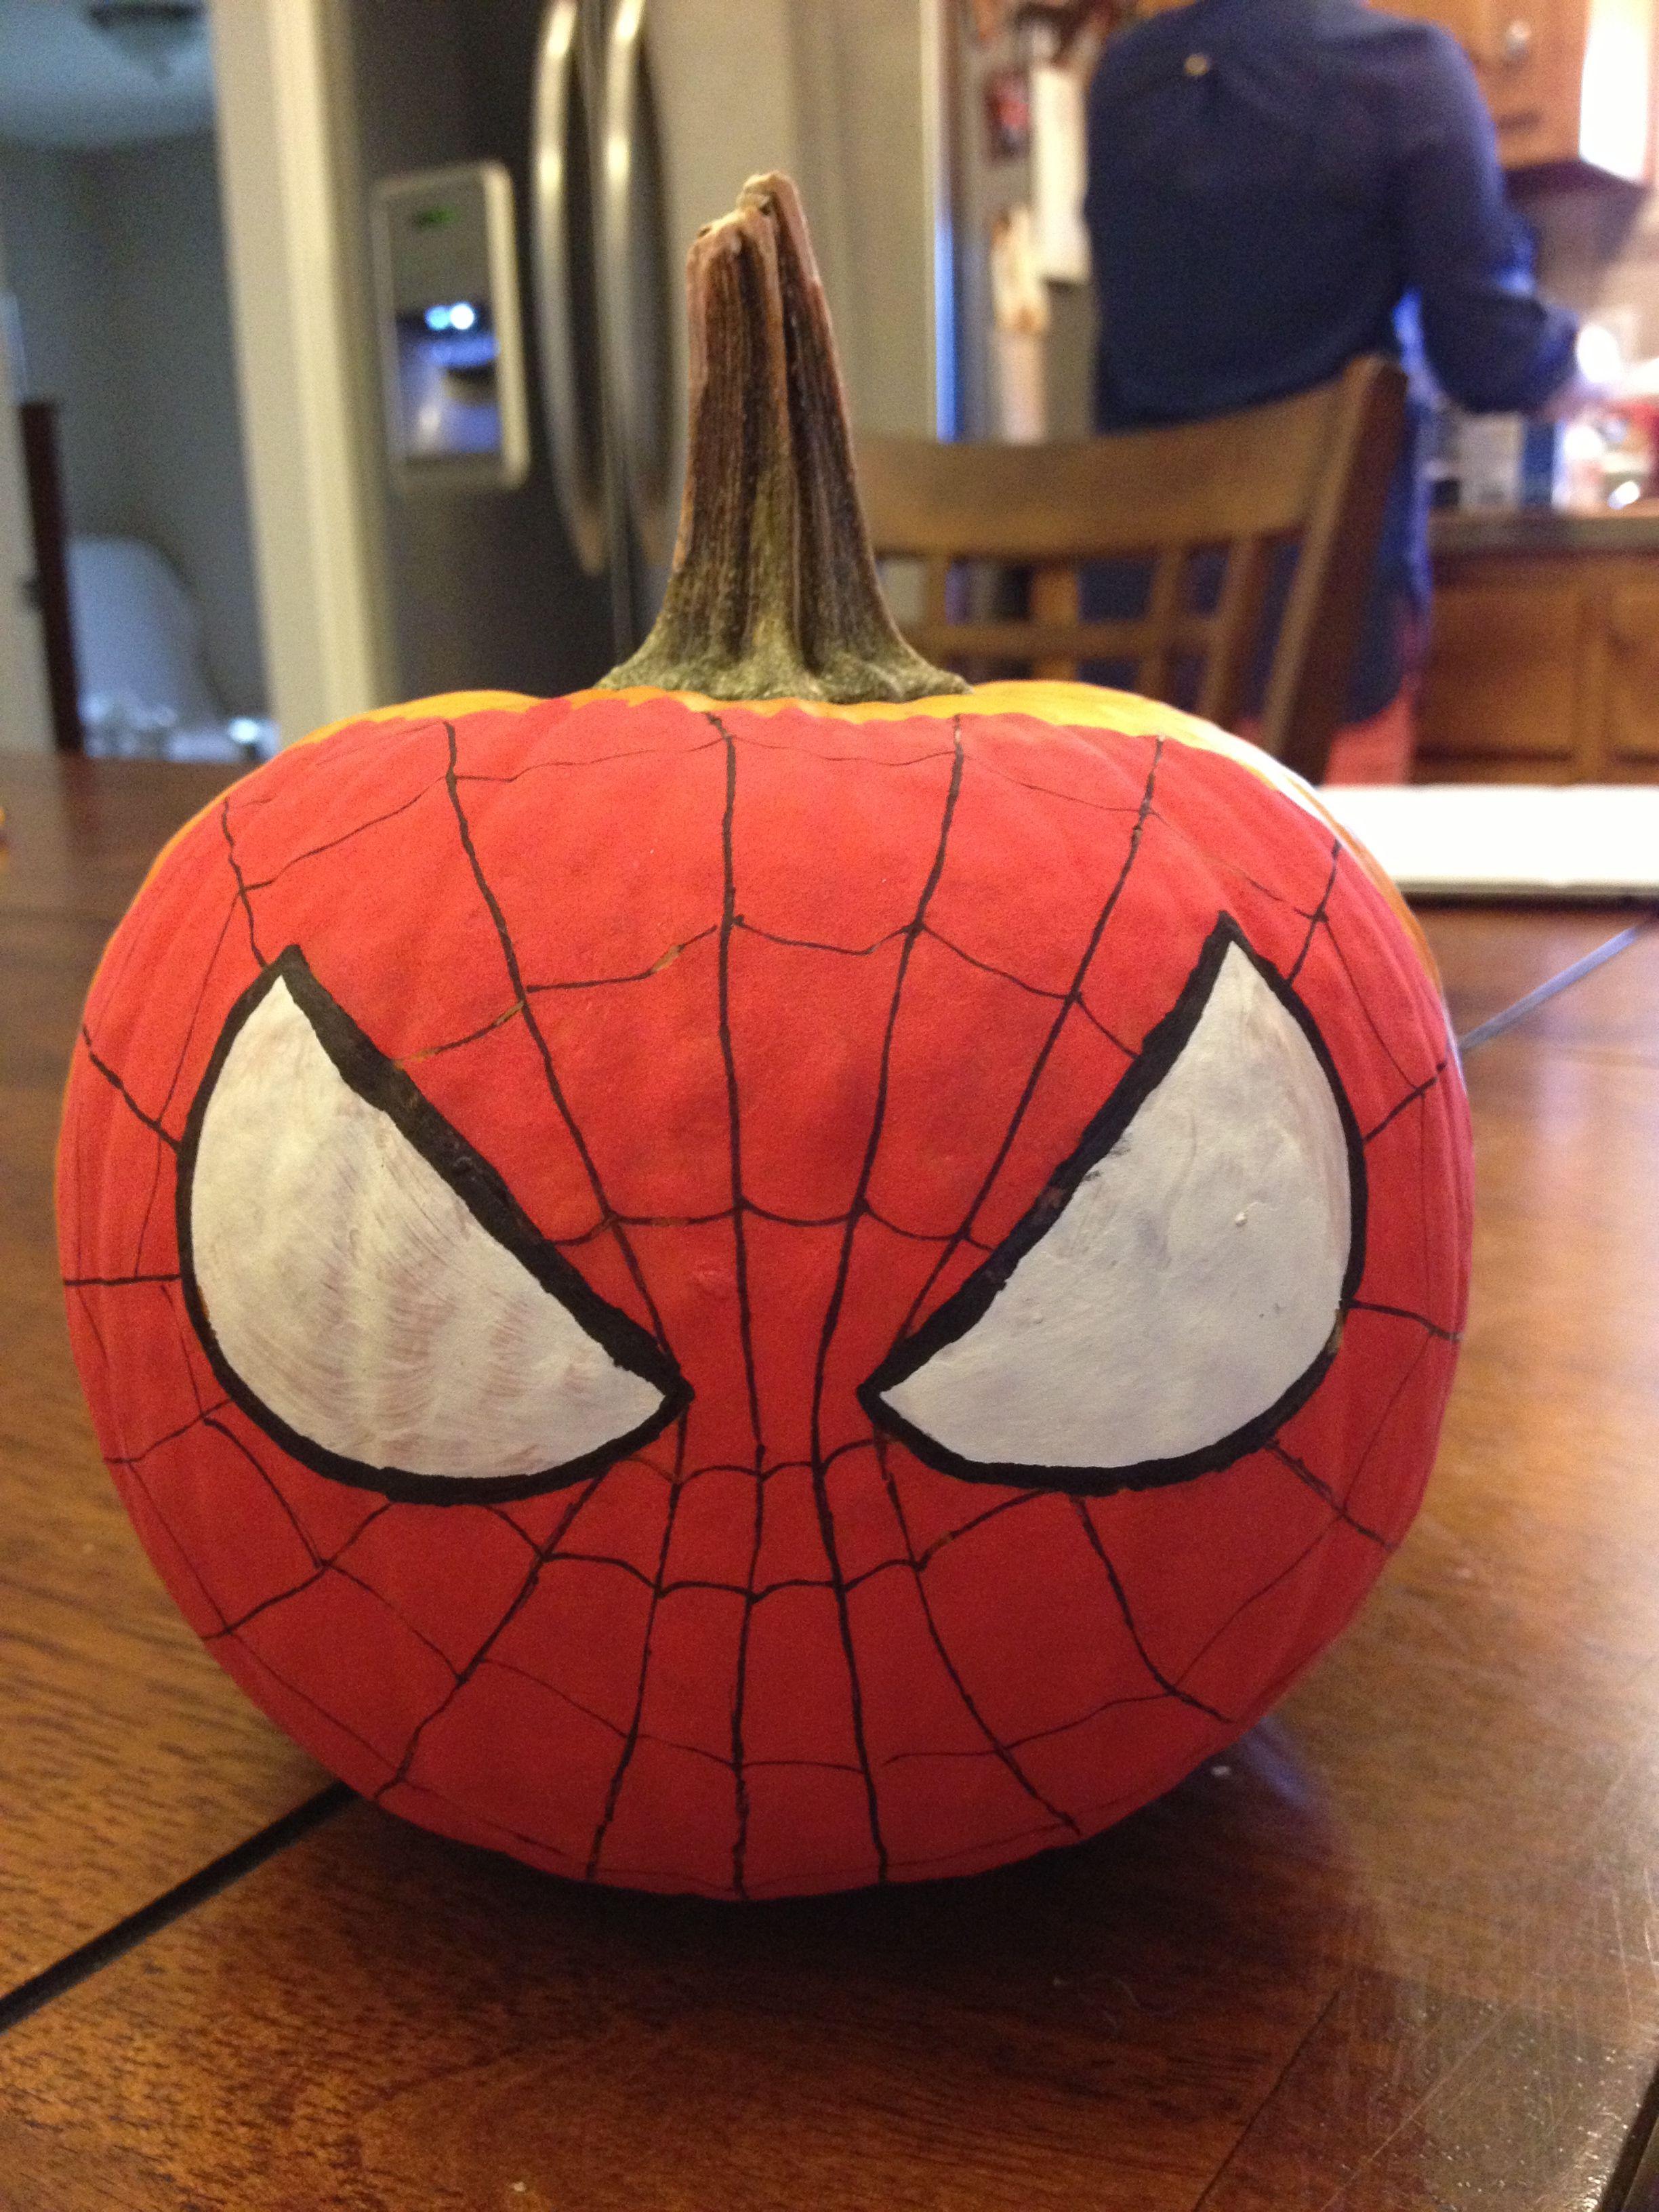 Harper's Spiderman pumpkin | Spiderman pumpkin, Halloween pumpkins ...